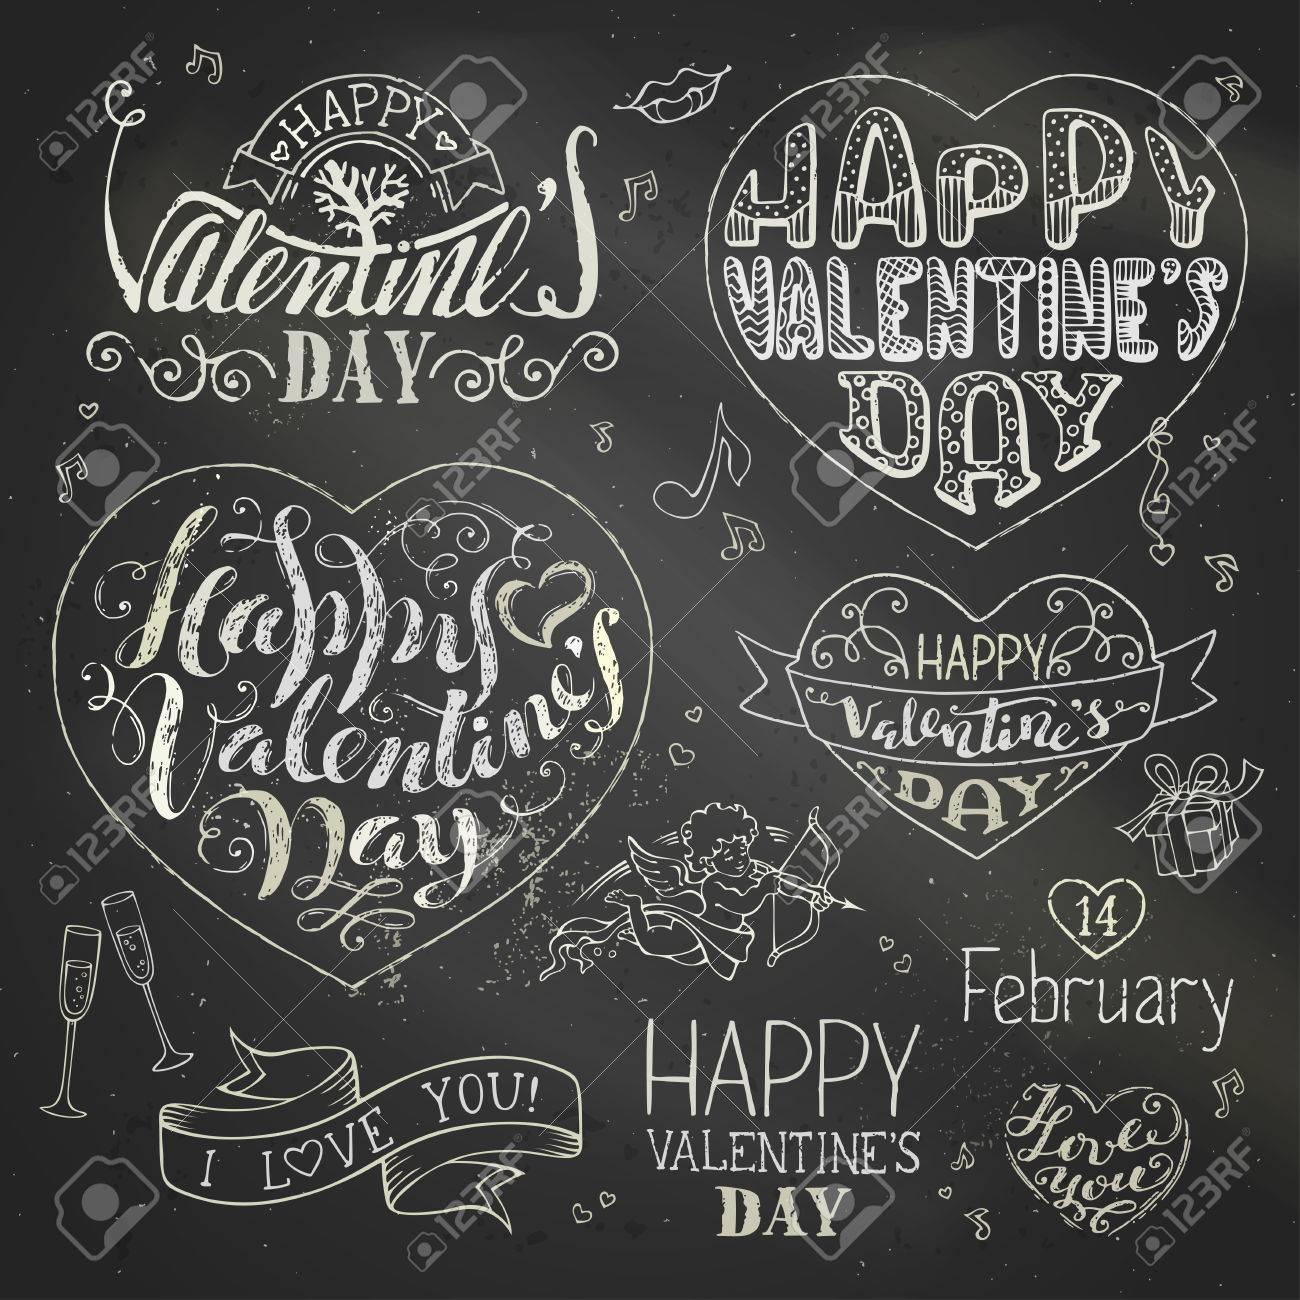 Feliz Dia De San Valentin Vector Conjunto De Frases Escritas A Mano